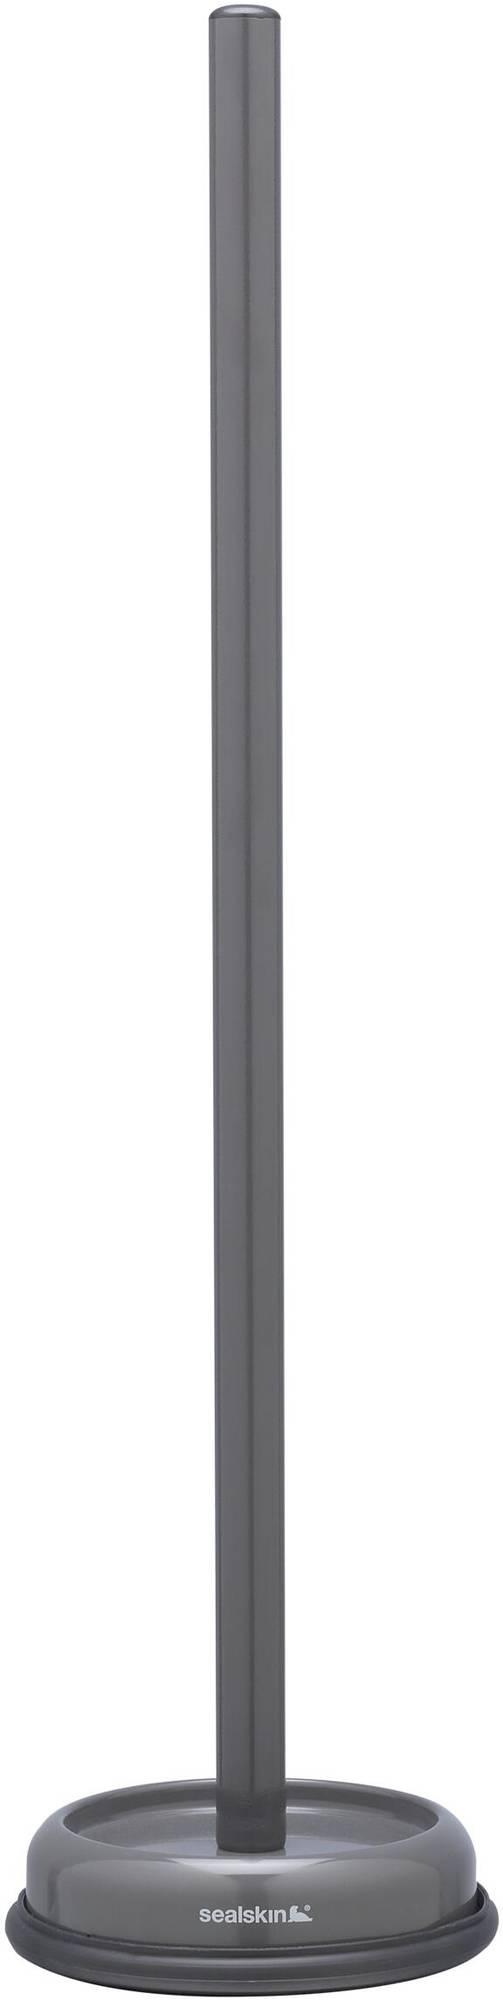 Sealskin Acero Toiletrolhouder Grijs